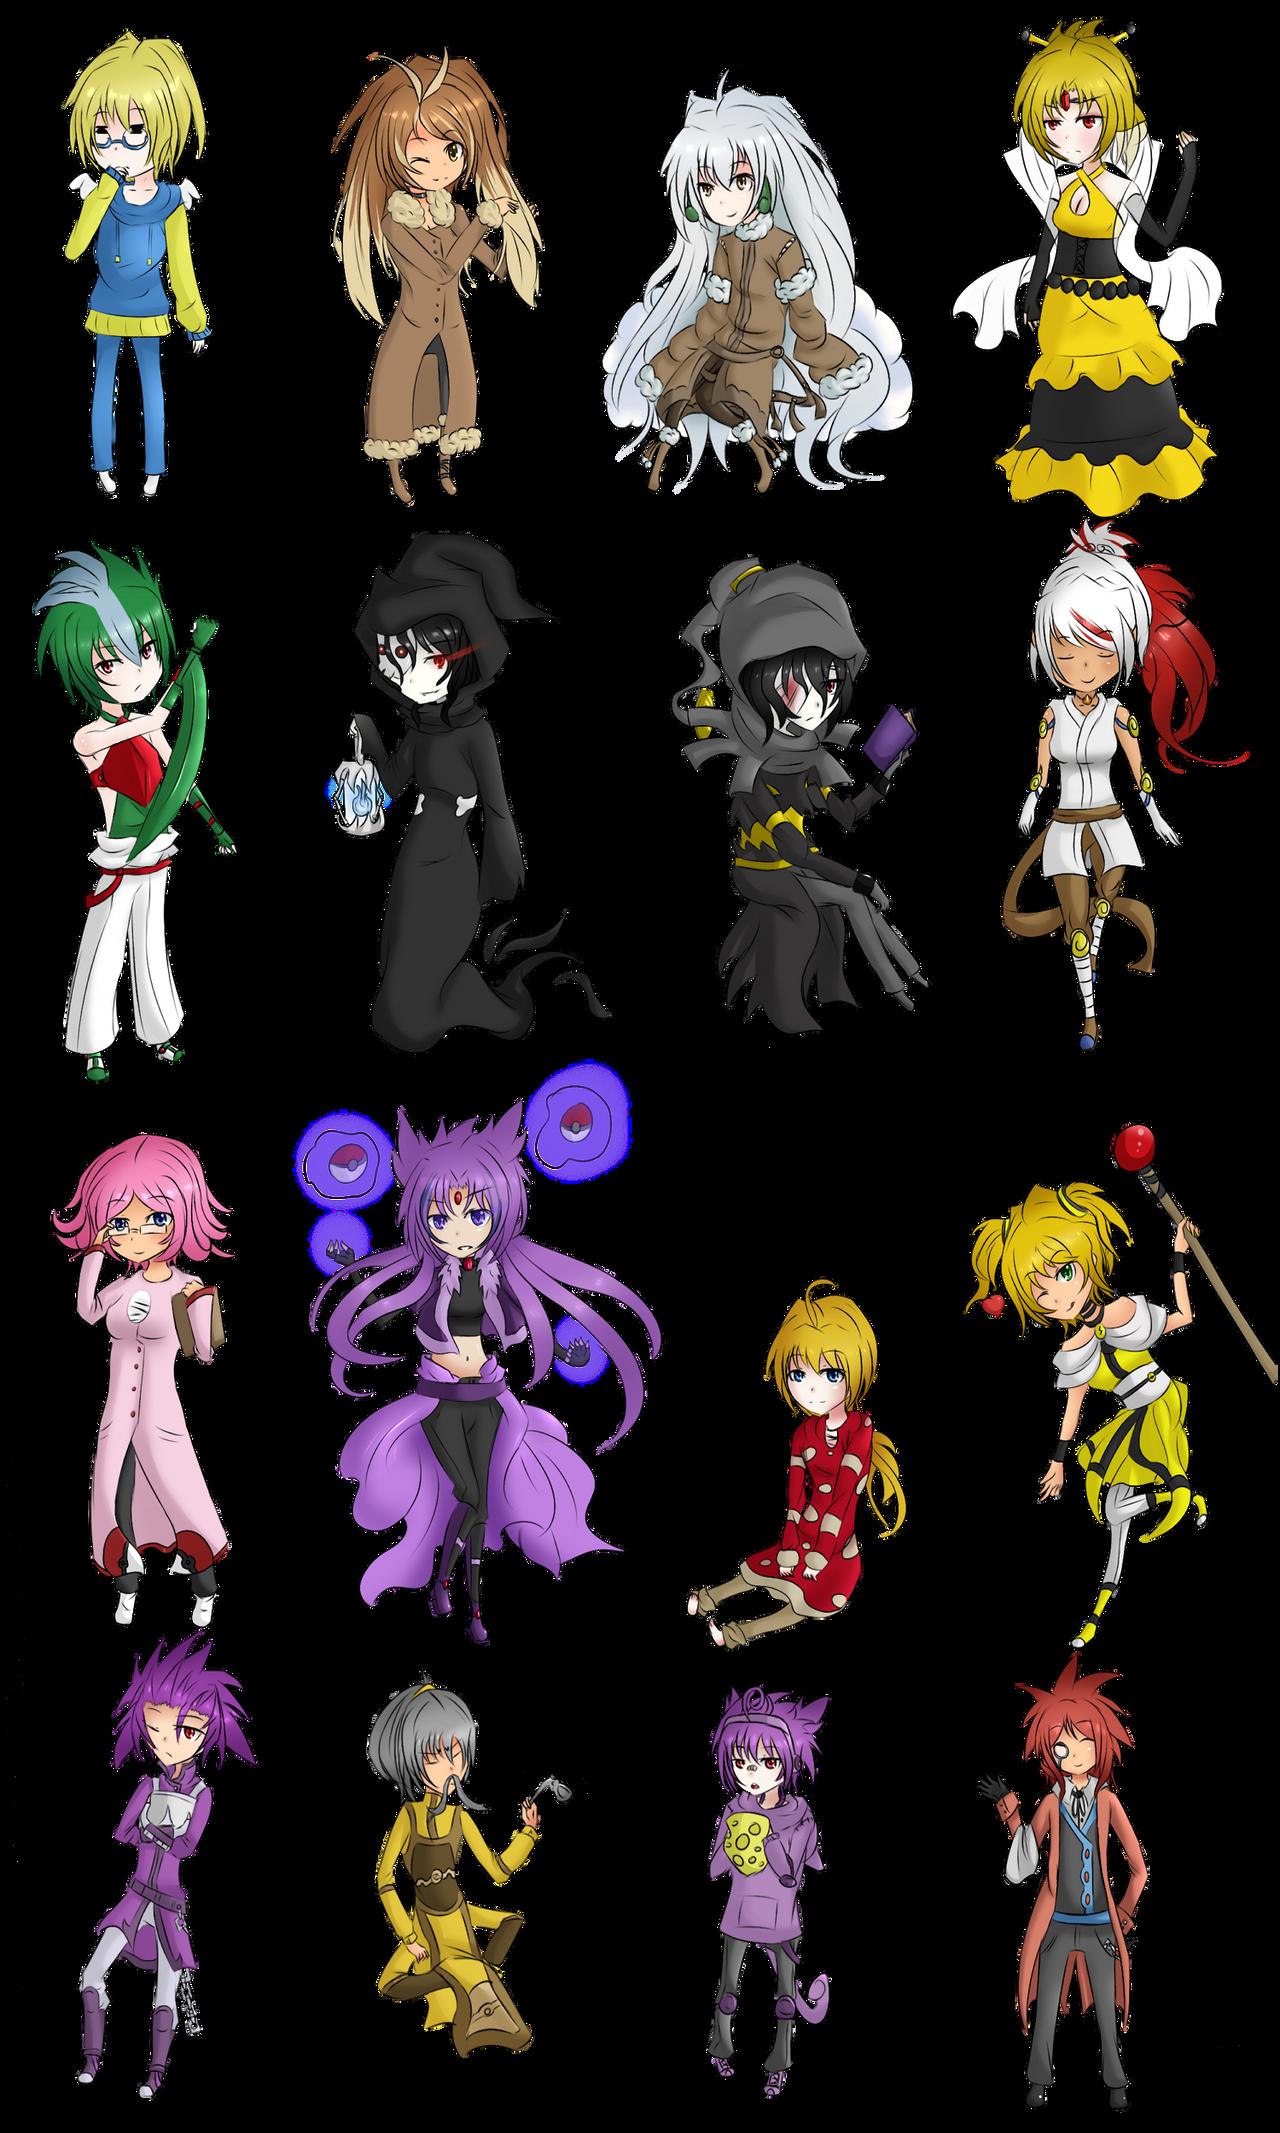 1000+ images about Pokemon Gijinka on Pinterest | Pokemon ...